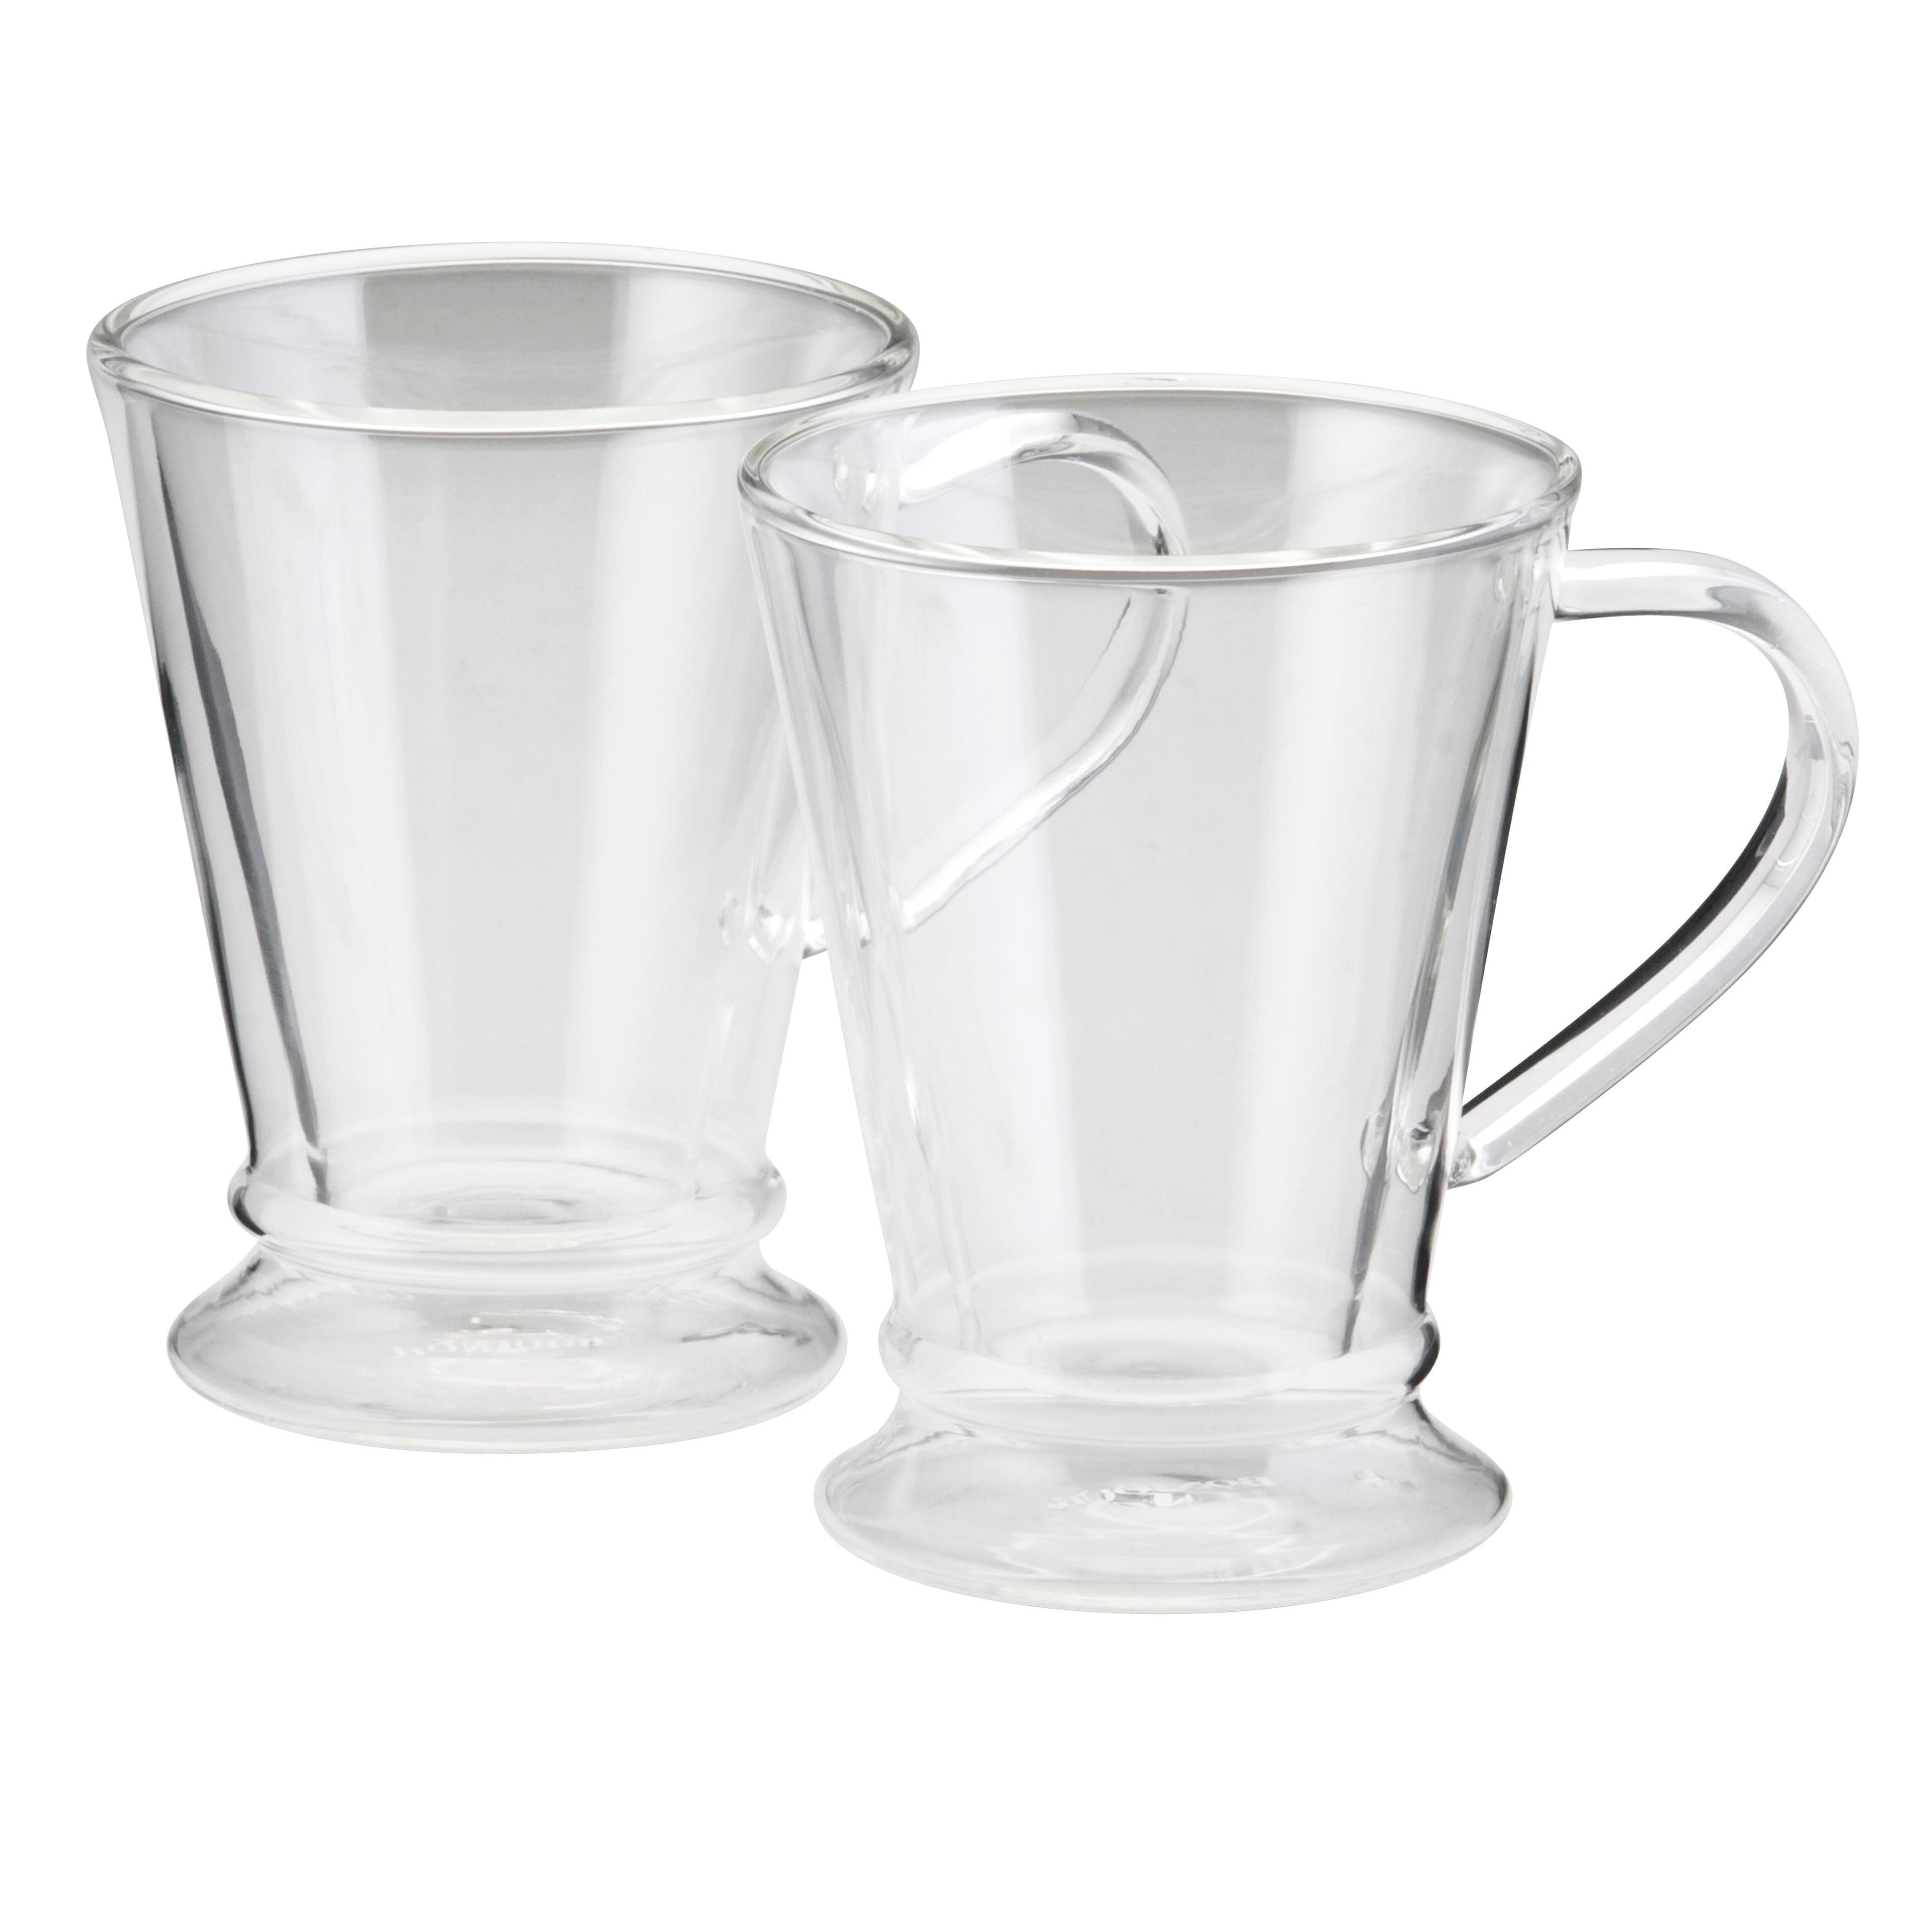 coffee mug set - bonjour(r) coffee insulated borosilicate glass coffee mugs piece set